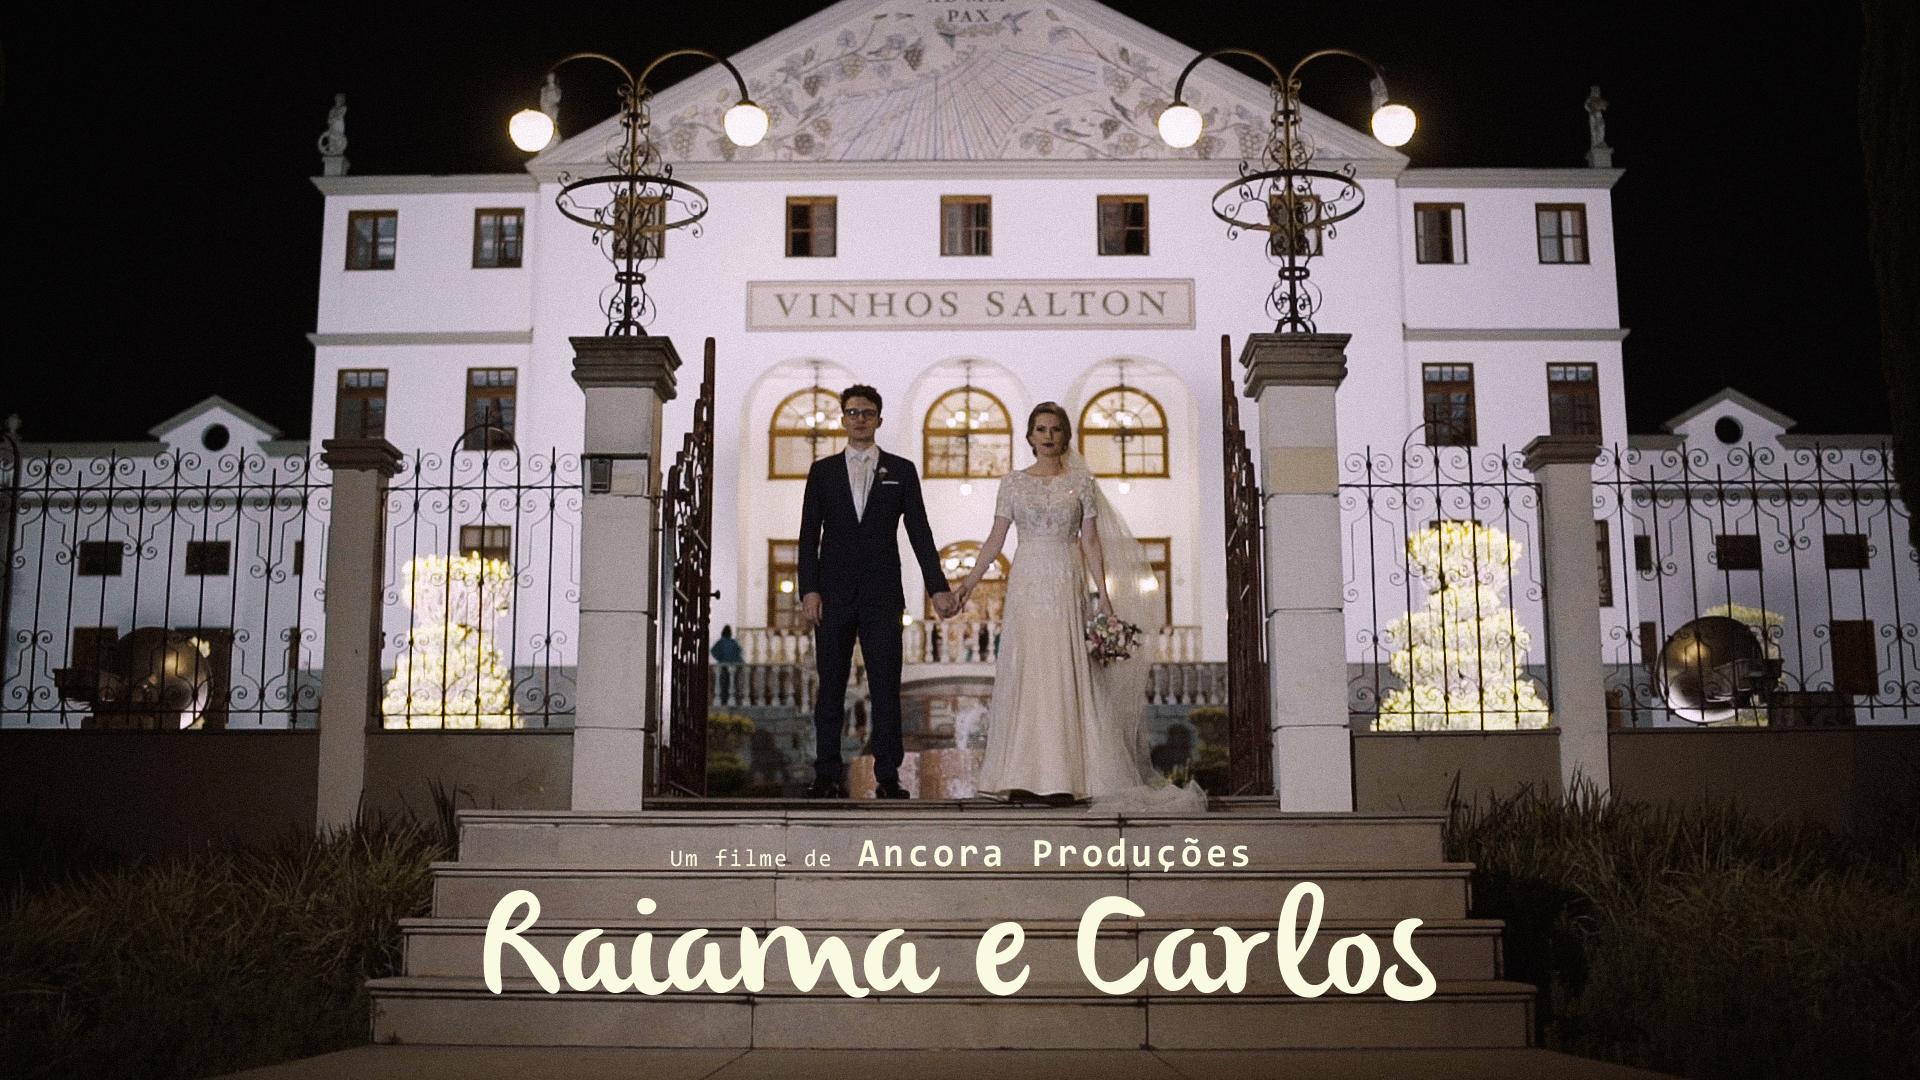 Raiama + Carlos | Bento Gonçalves, Rio Grande do Sul, Brazil | Vinícola Salton